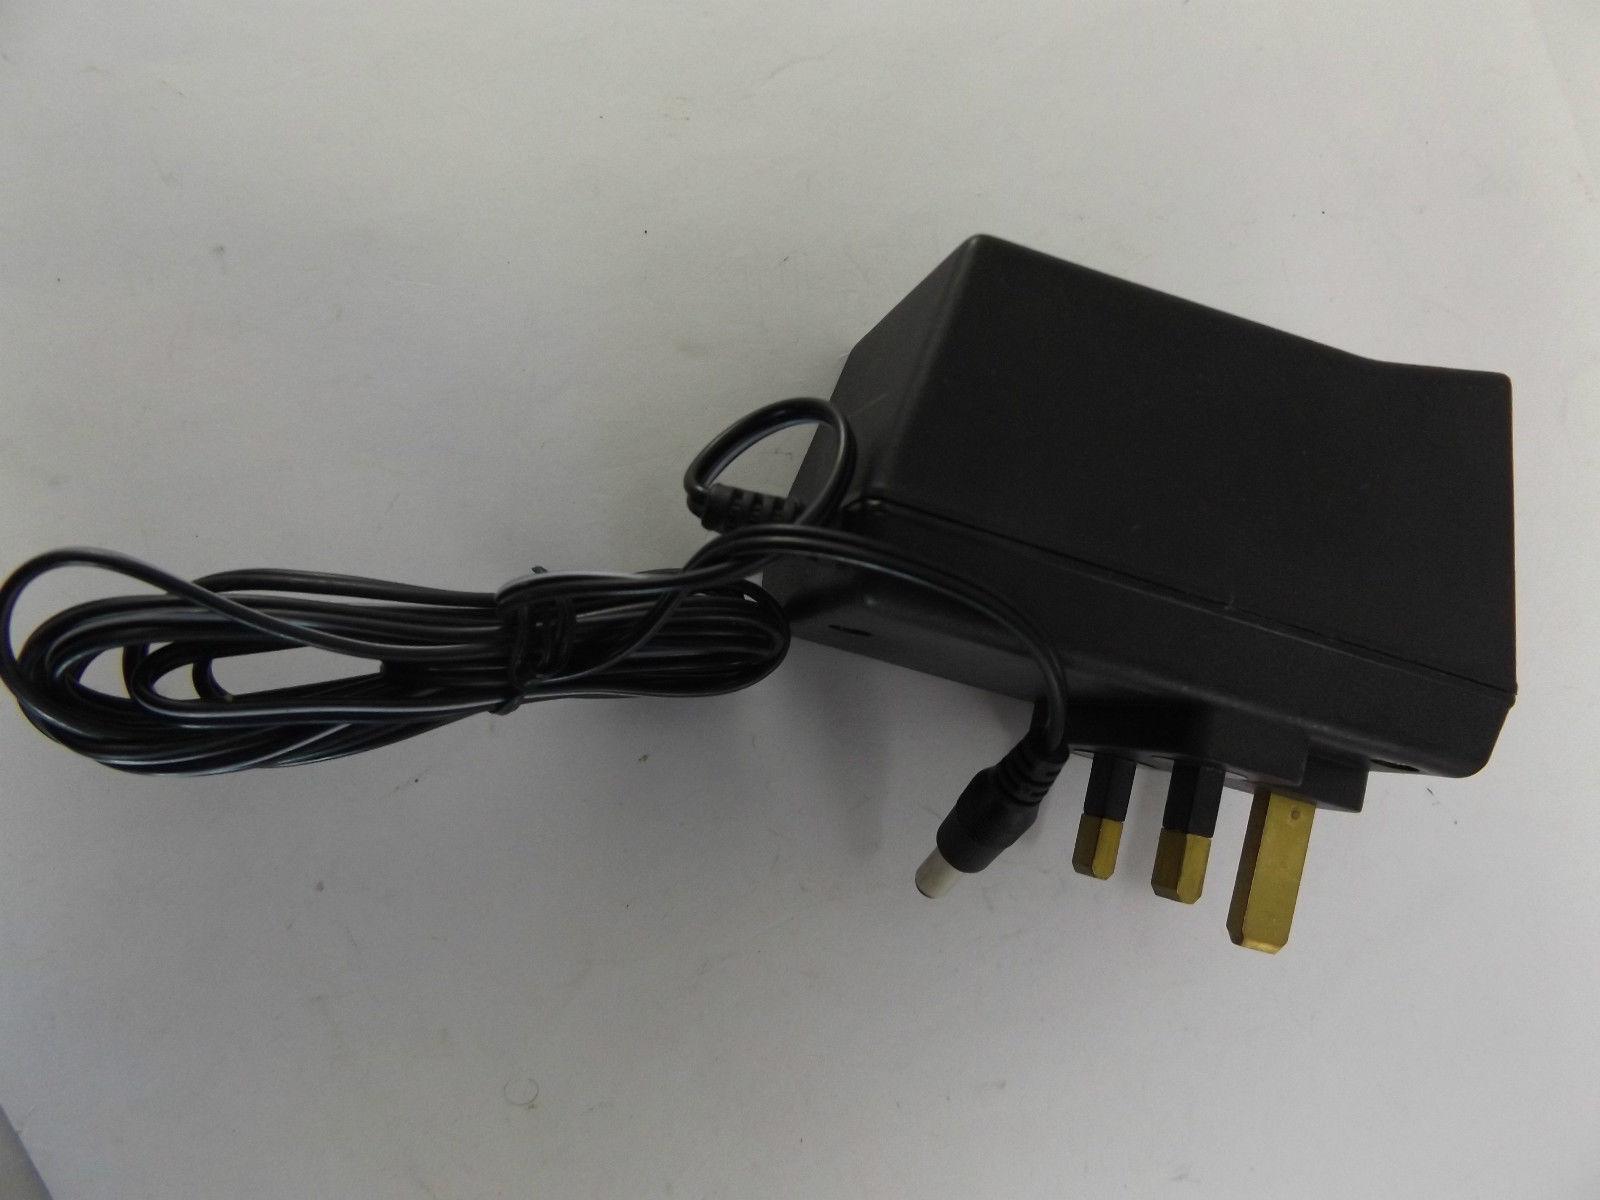 Power Plus Adapter PBUK993 Input 230V 50Hz 100mA Output 9V 400mA